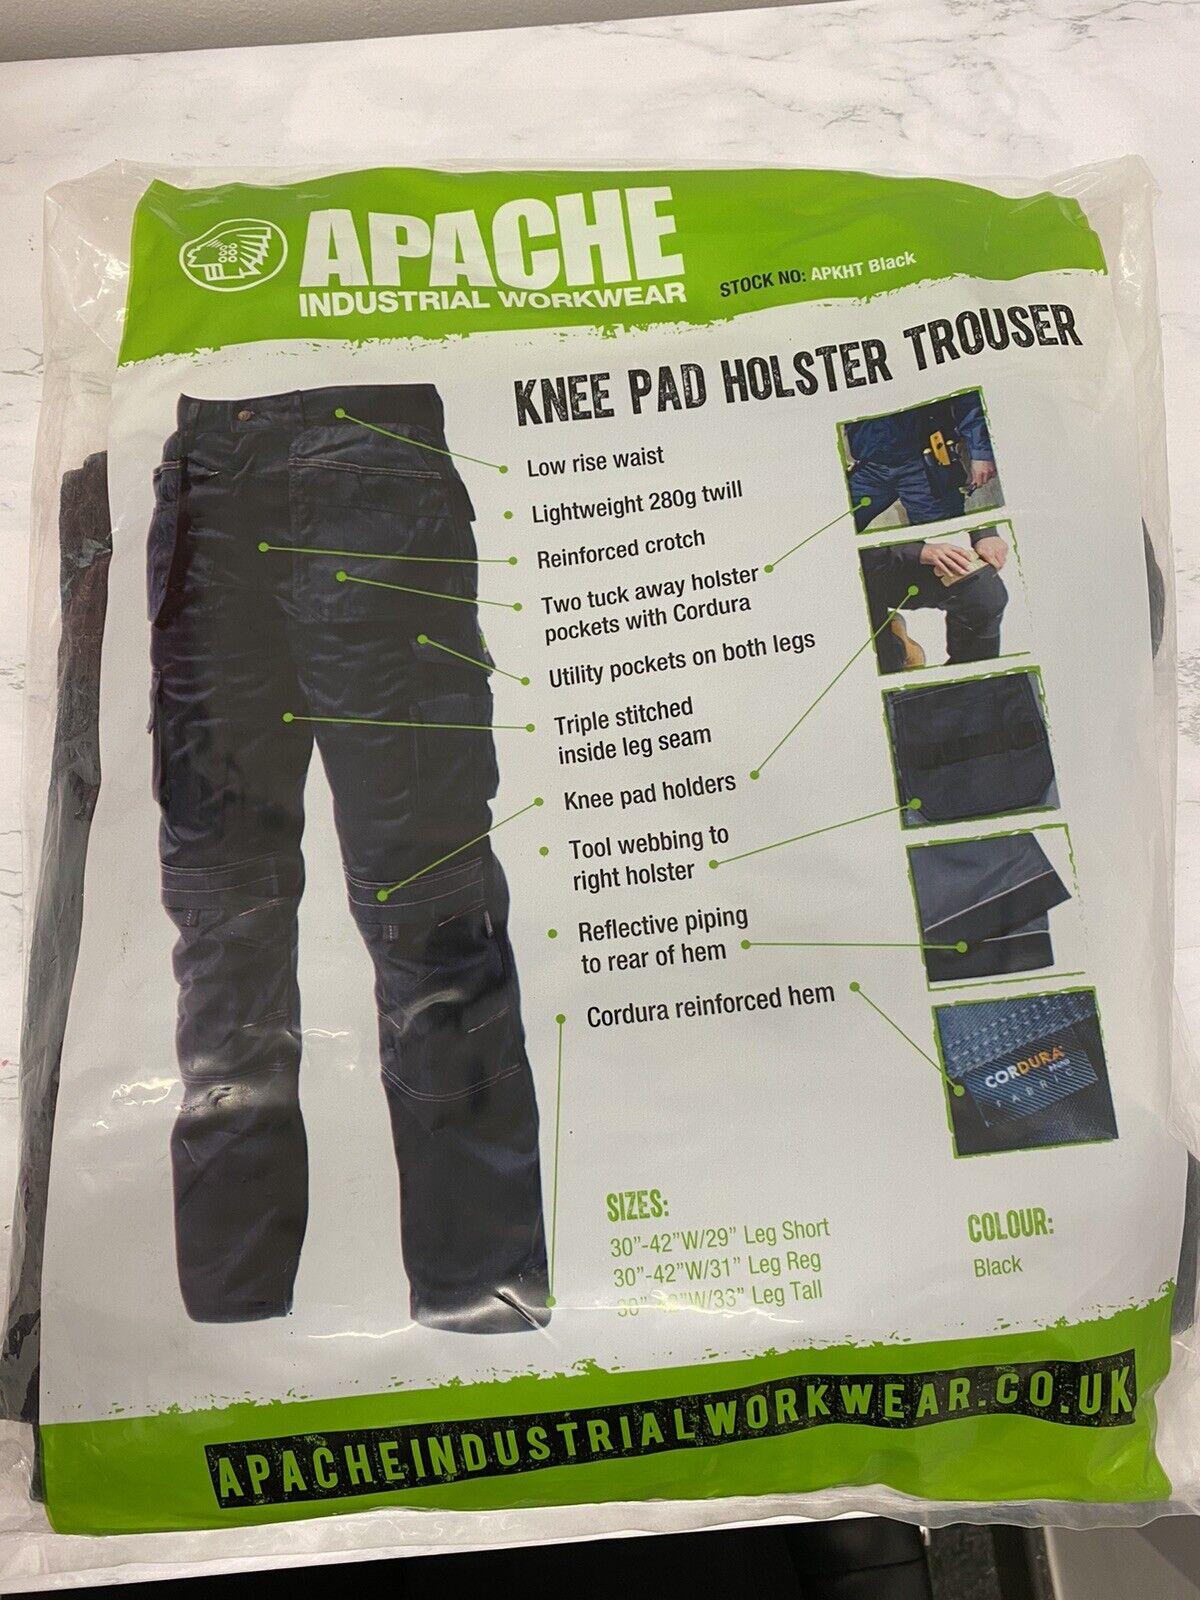 Apache Knee Pad Holster Black Trouser Size W40/L31 #23